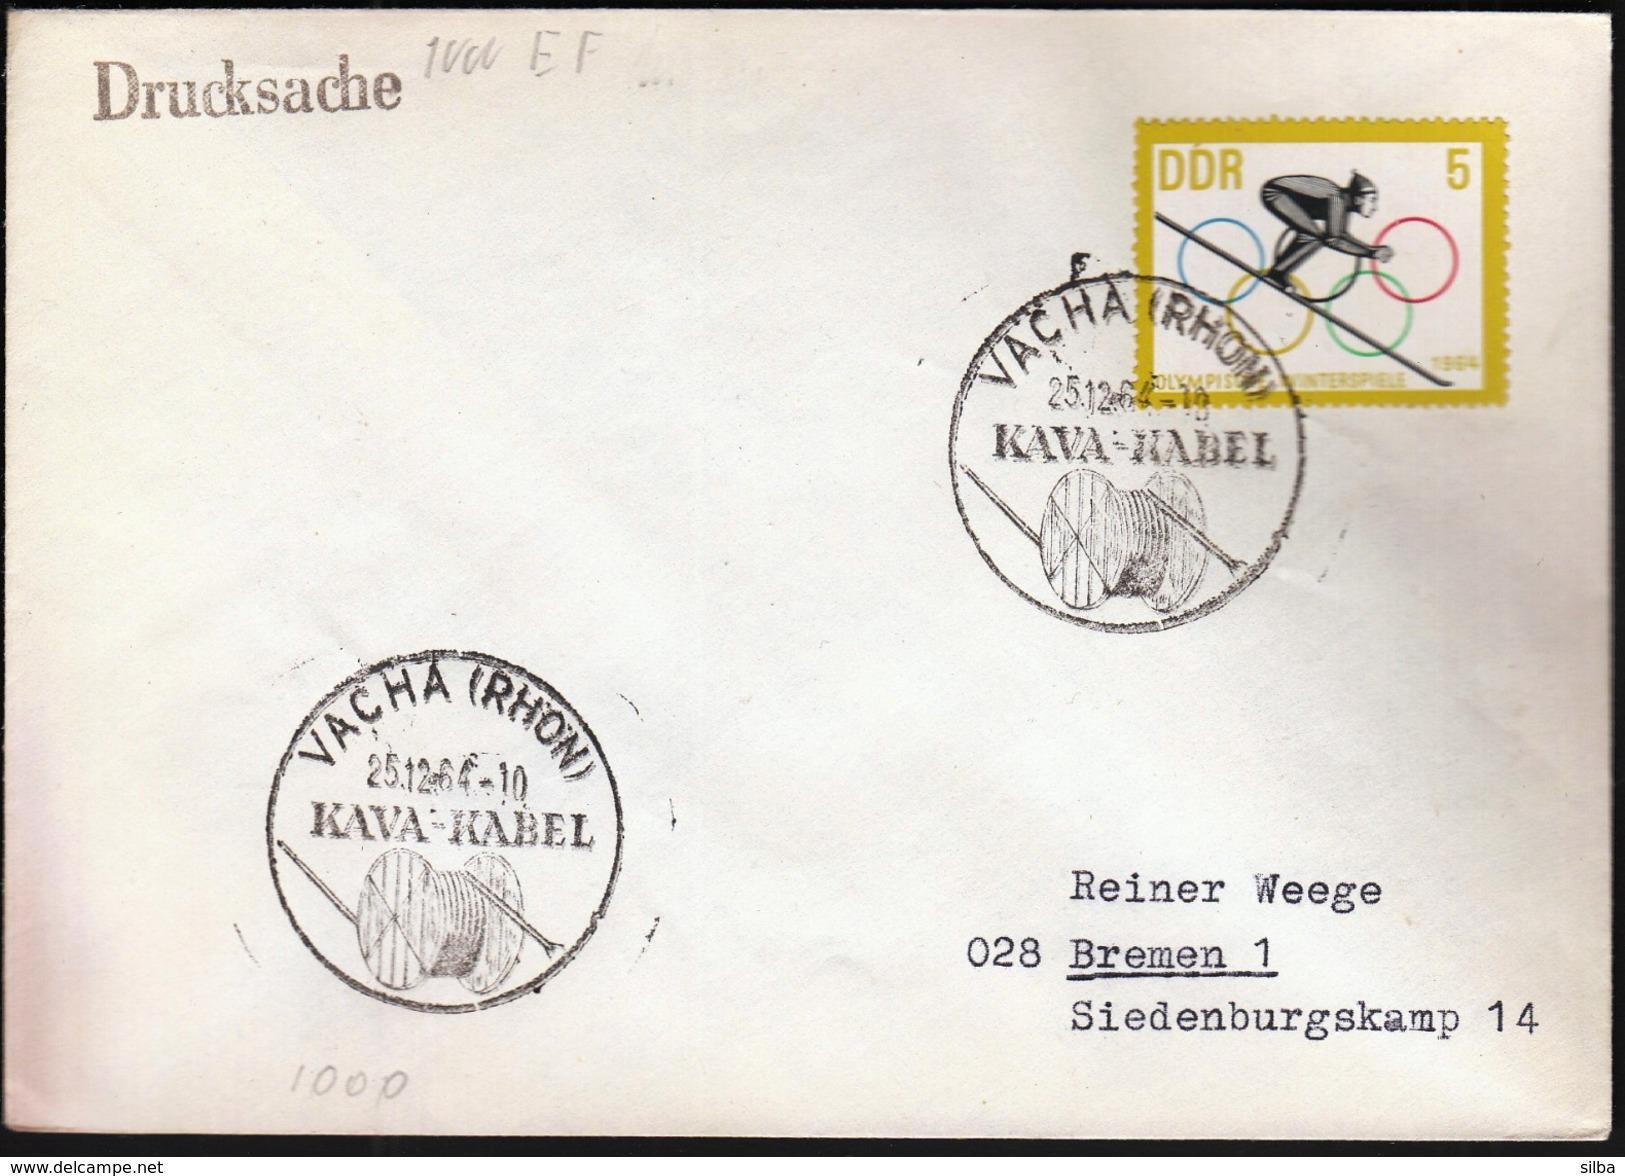 Germany Vacha (Rhon) 1964 / Kava - Kabel / Cabel Industry - Fabbriche E Imprese